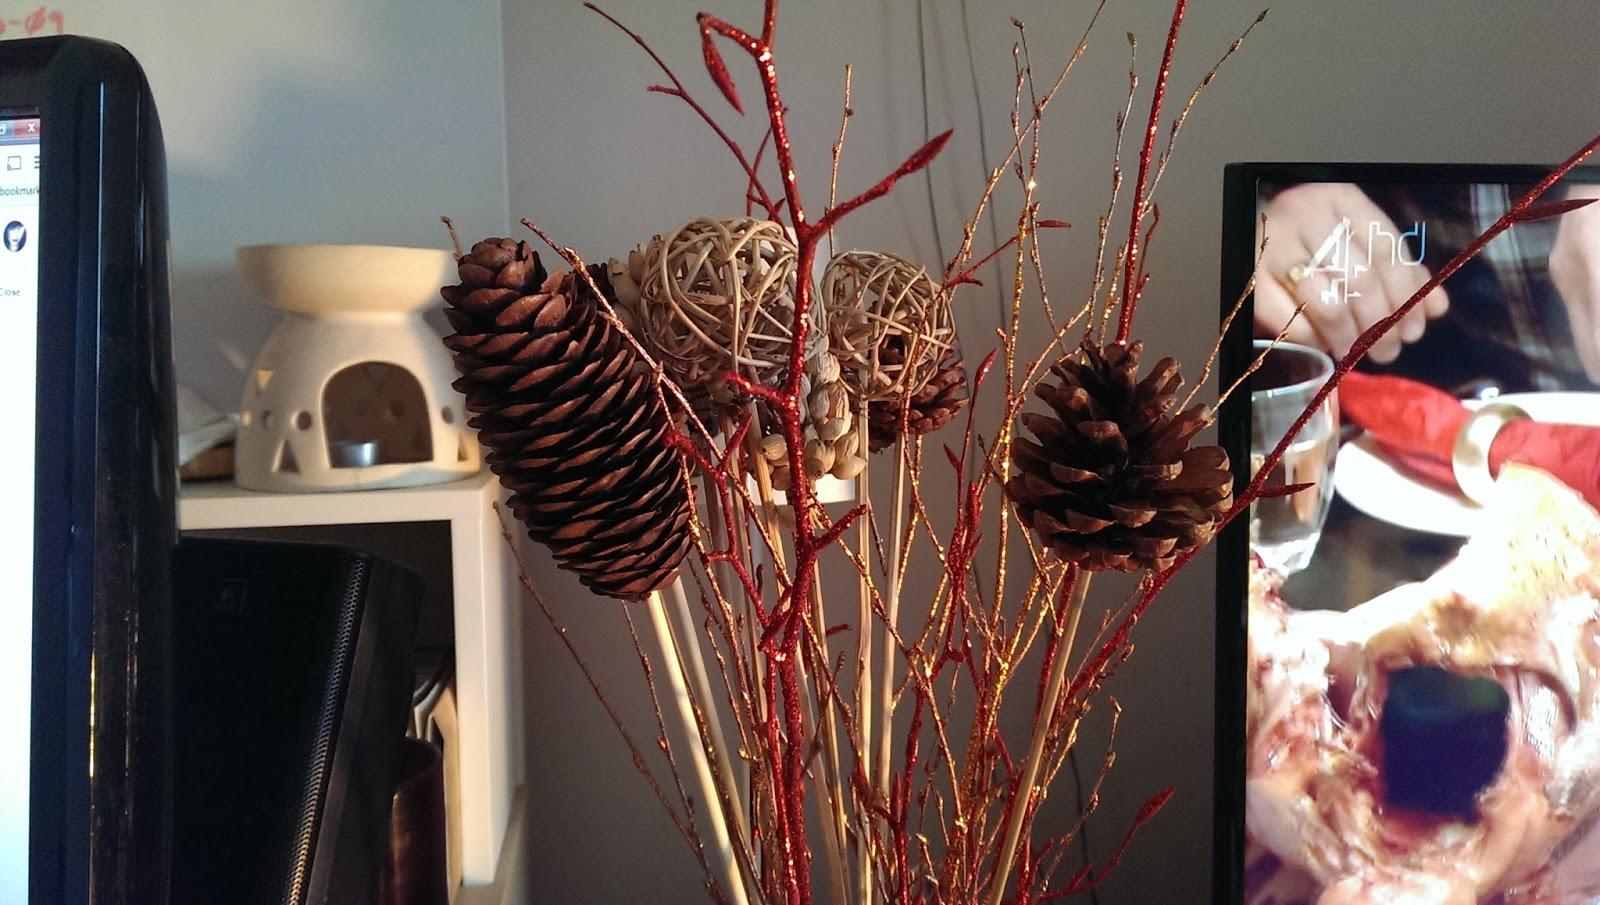 Festive arrangement from Aldi